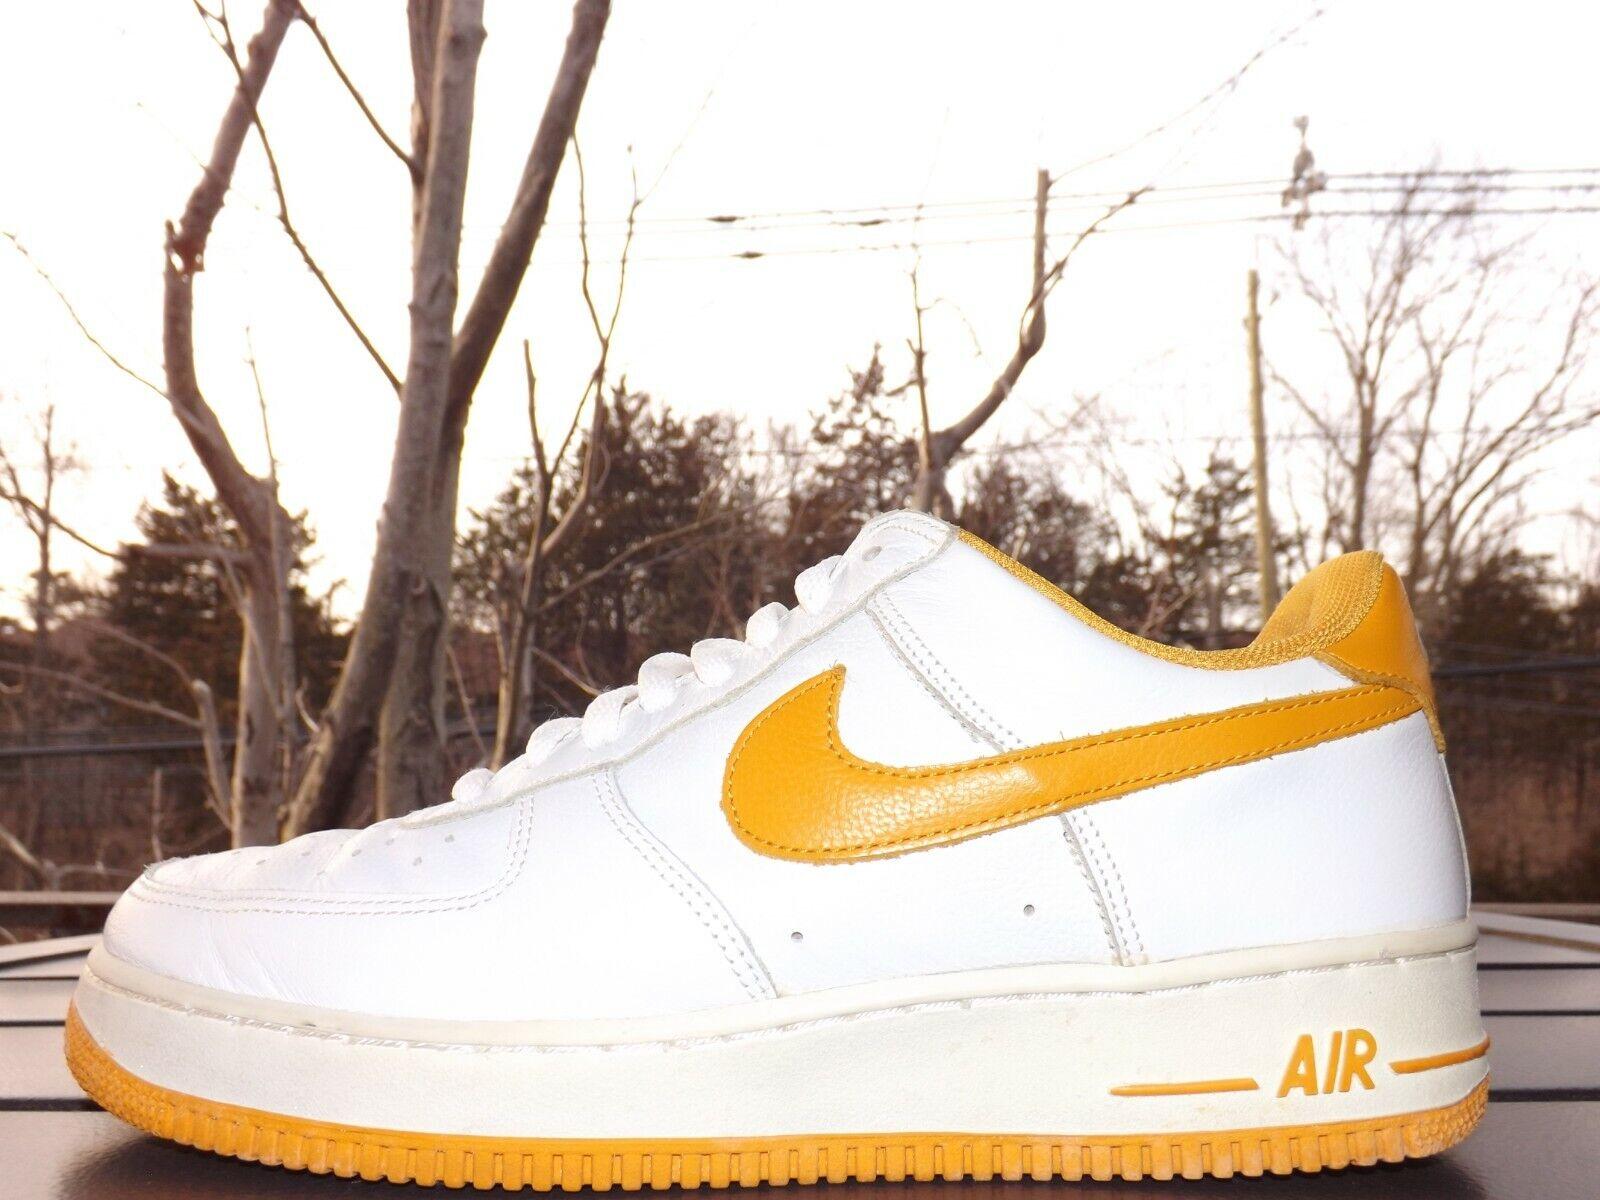 RARE Men's Nike Air Force 1 - White Canyon gold - Size 11.5